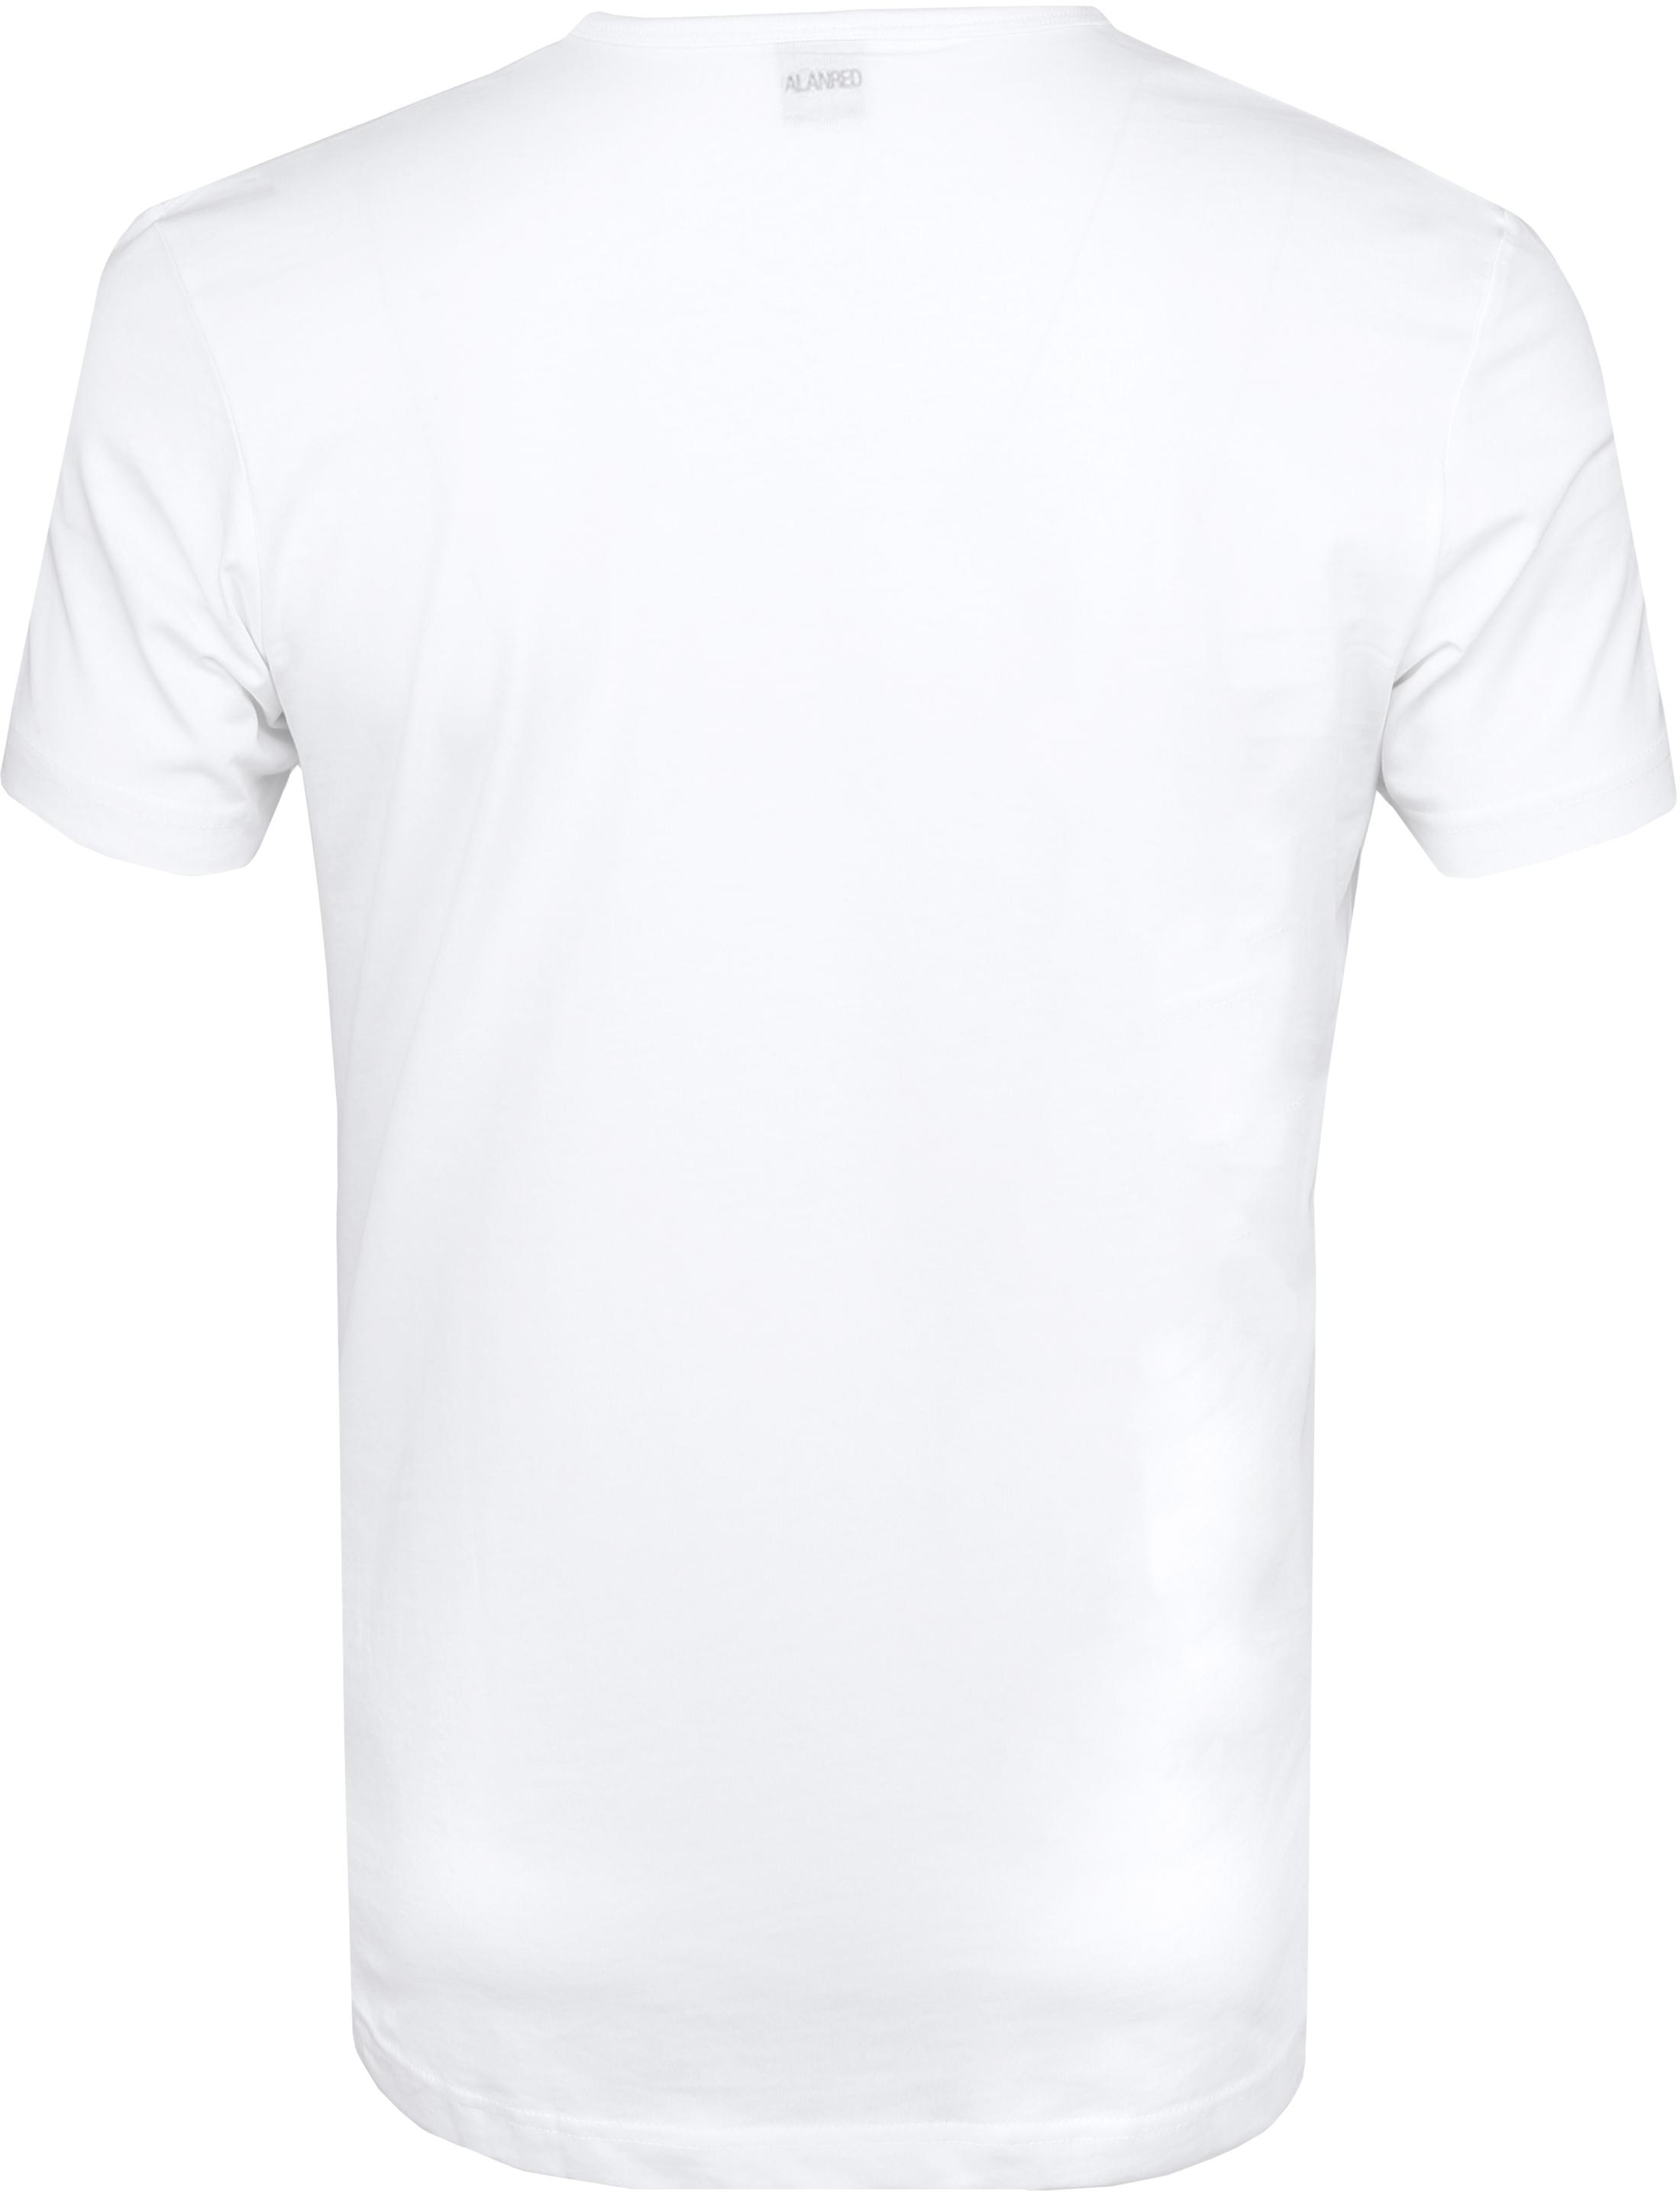 Alan Red T-Shirt Derby Weiß  (2er-Pack) foto 3